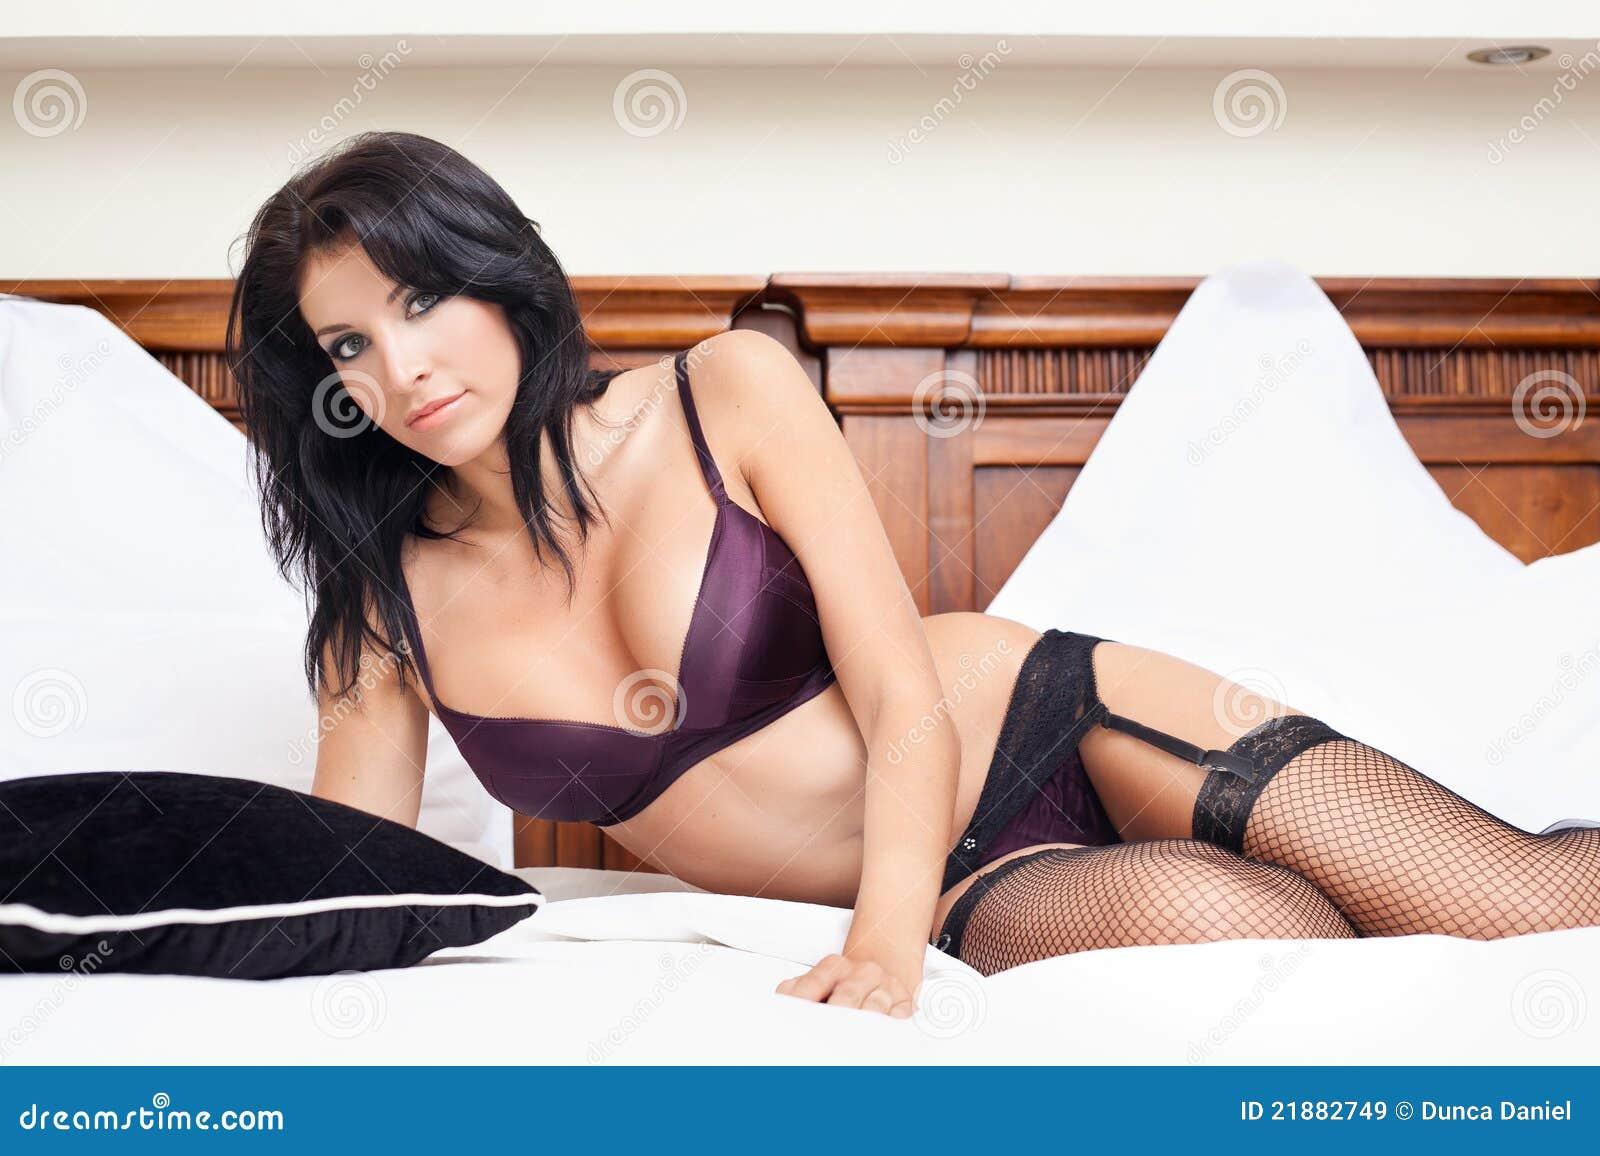 Asians woman hidden camera nude